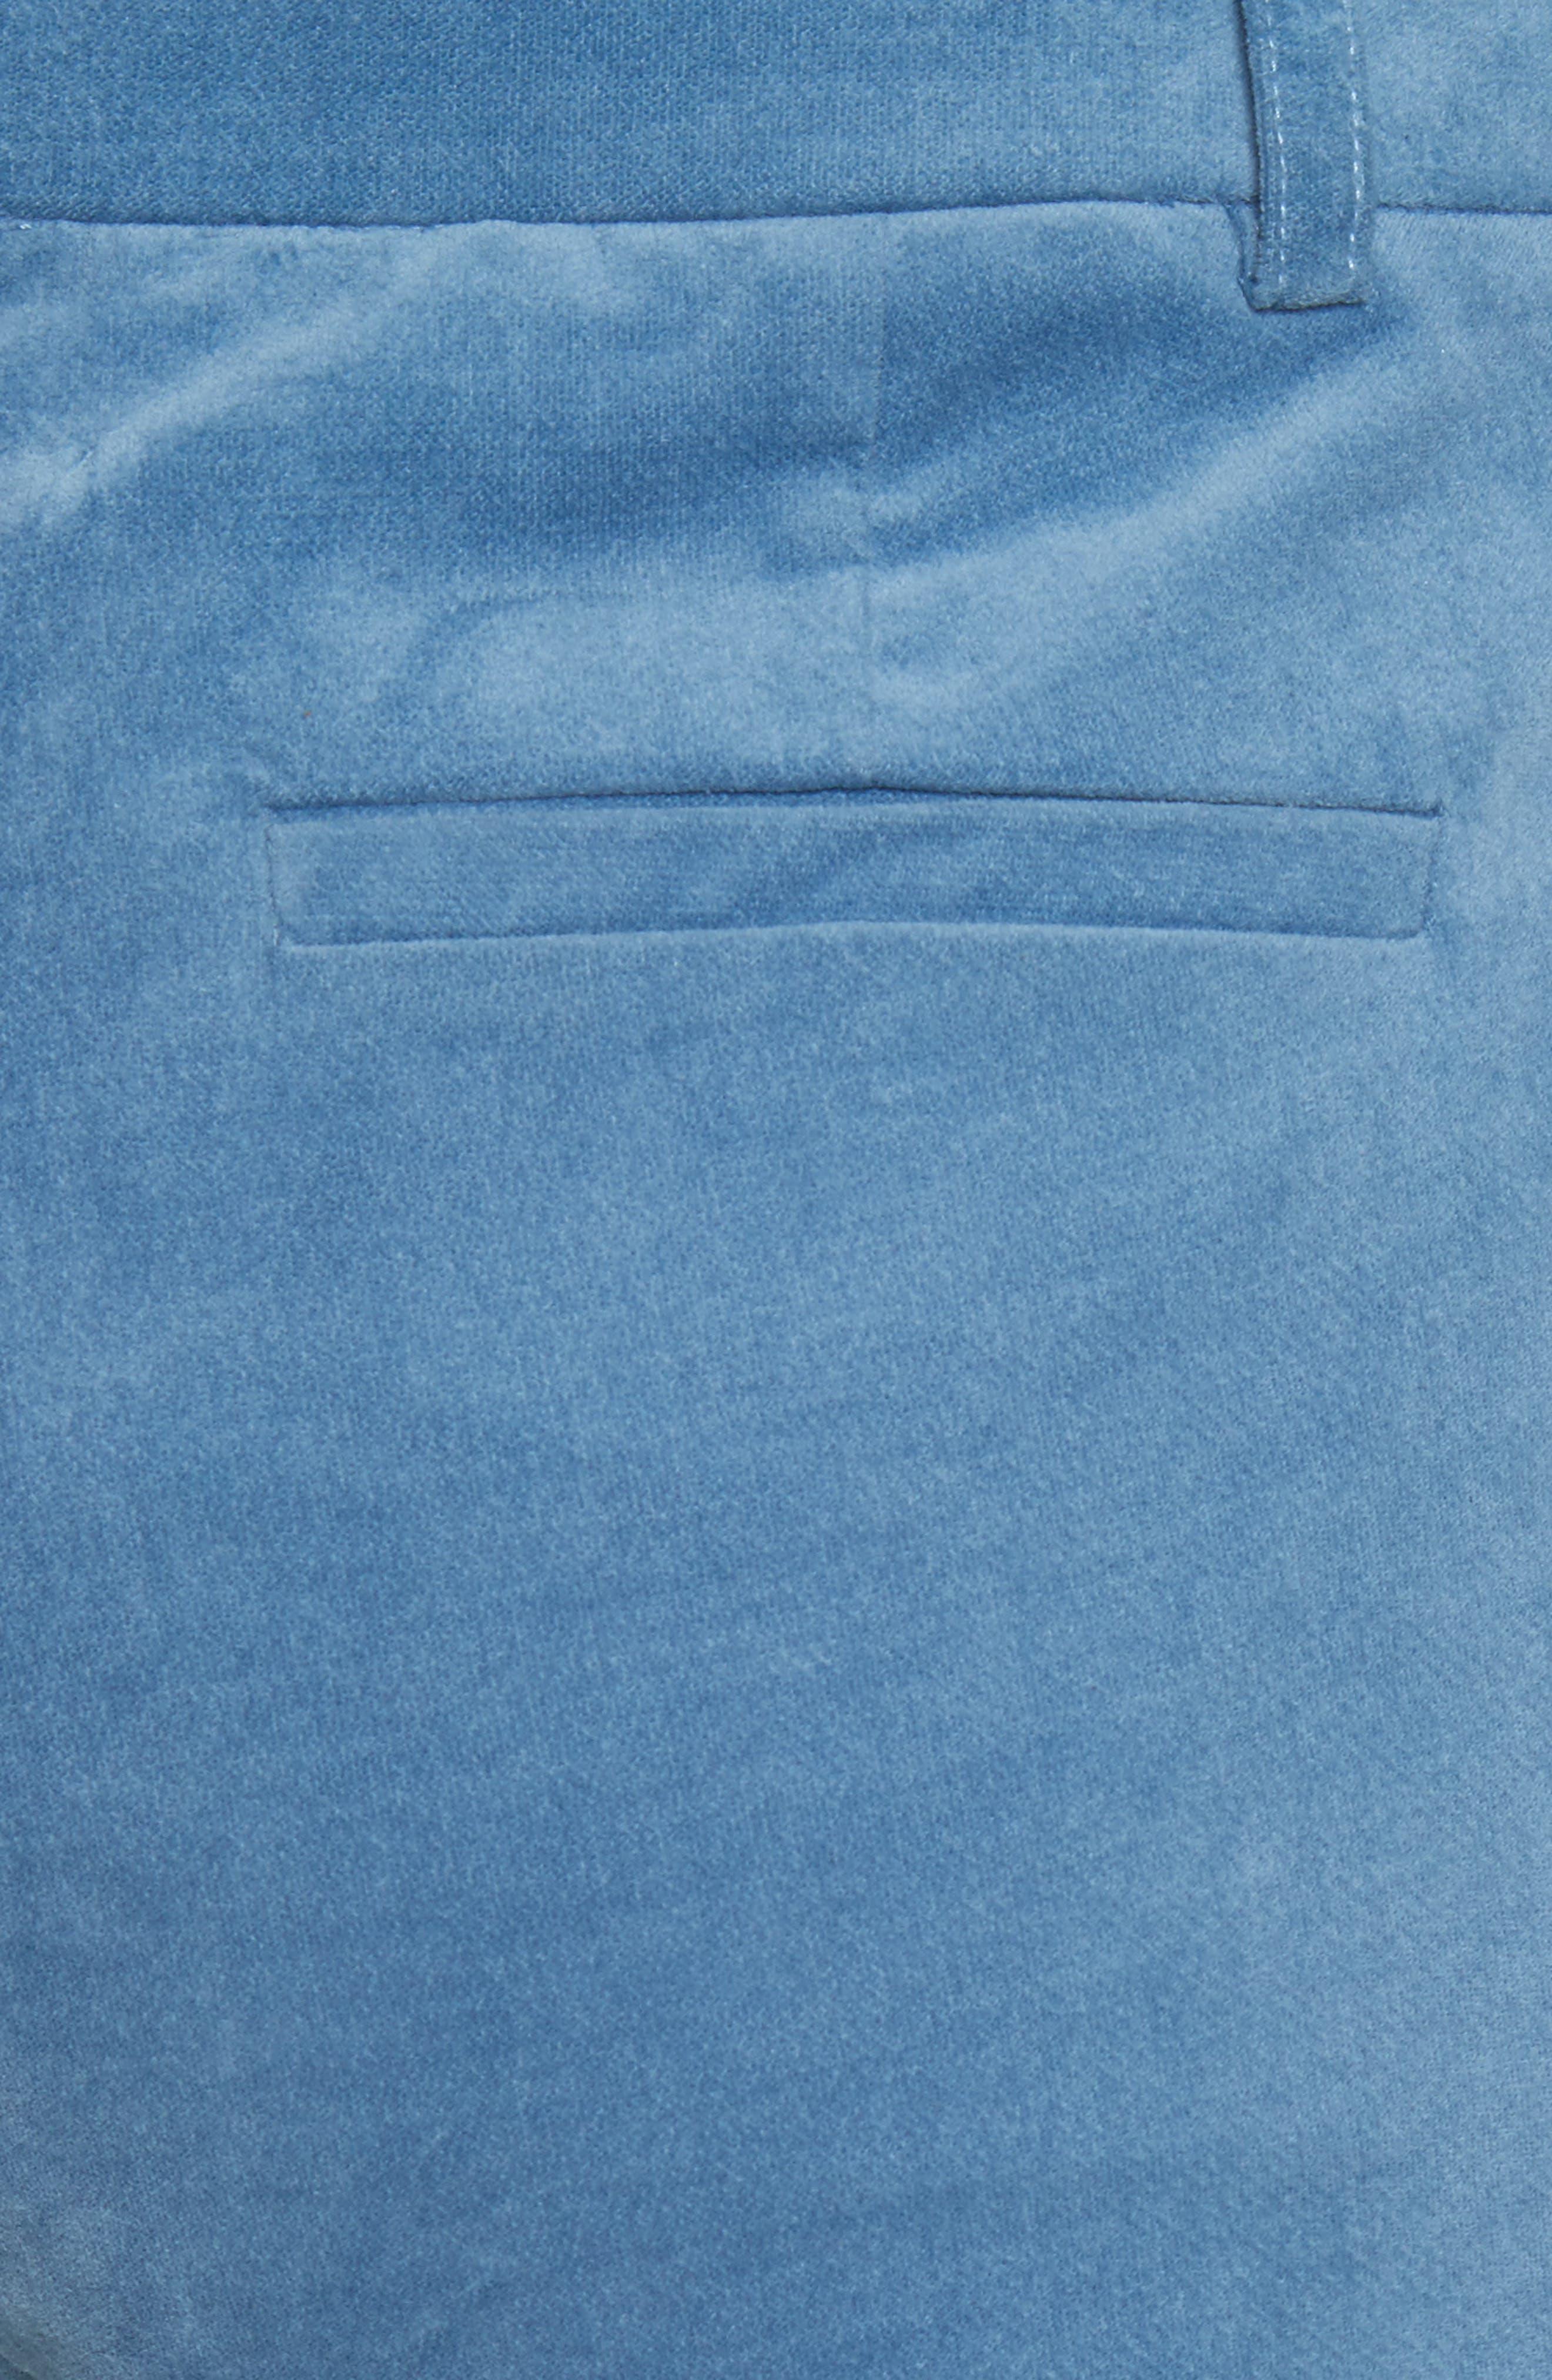 Moleskin Stretch Cotton Skinny Pants,                             Alternate thumbnail 5, color,                             400